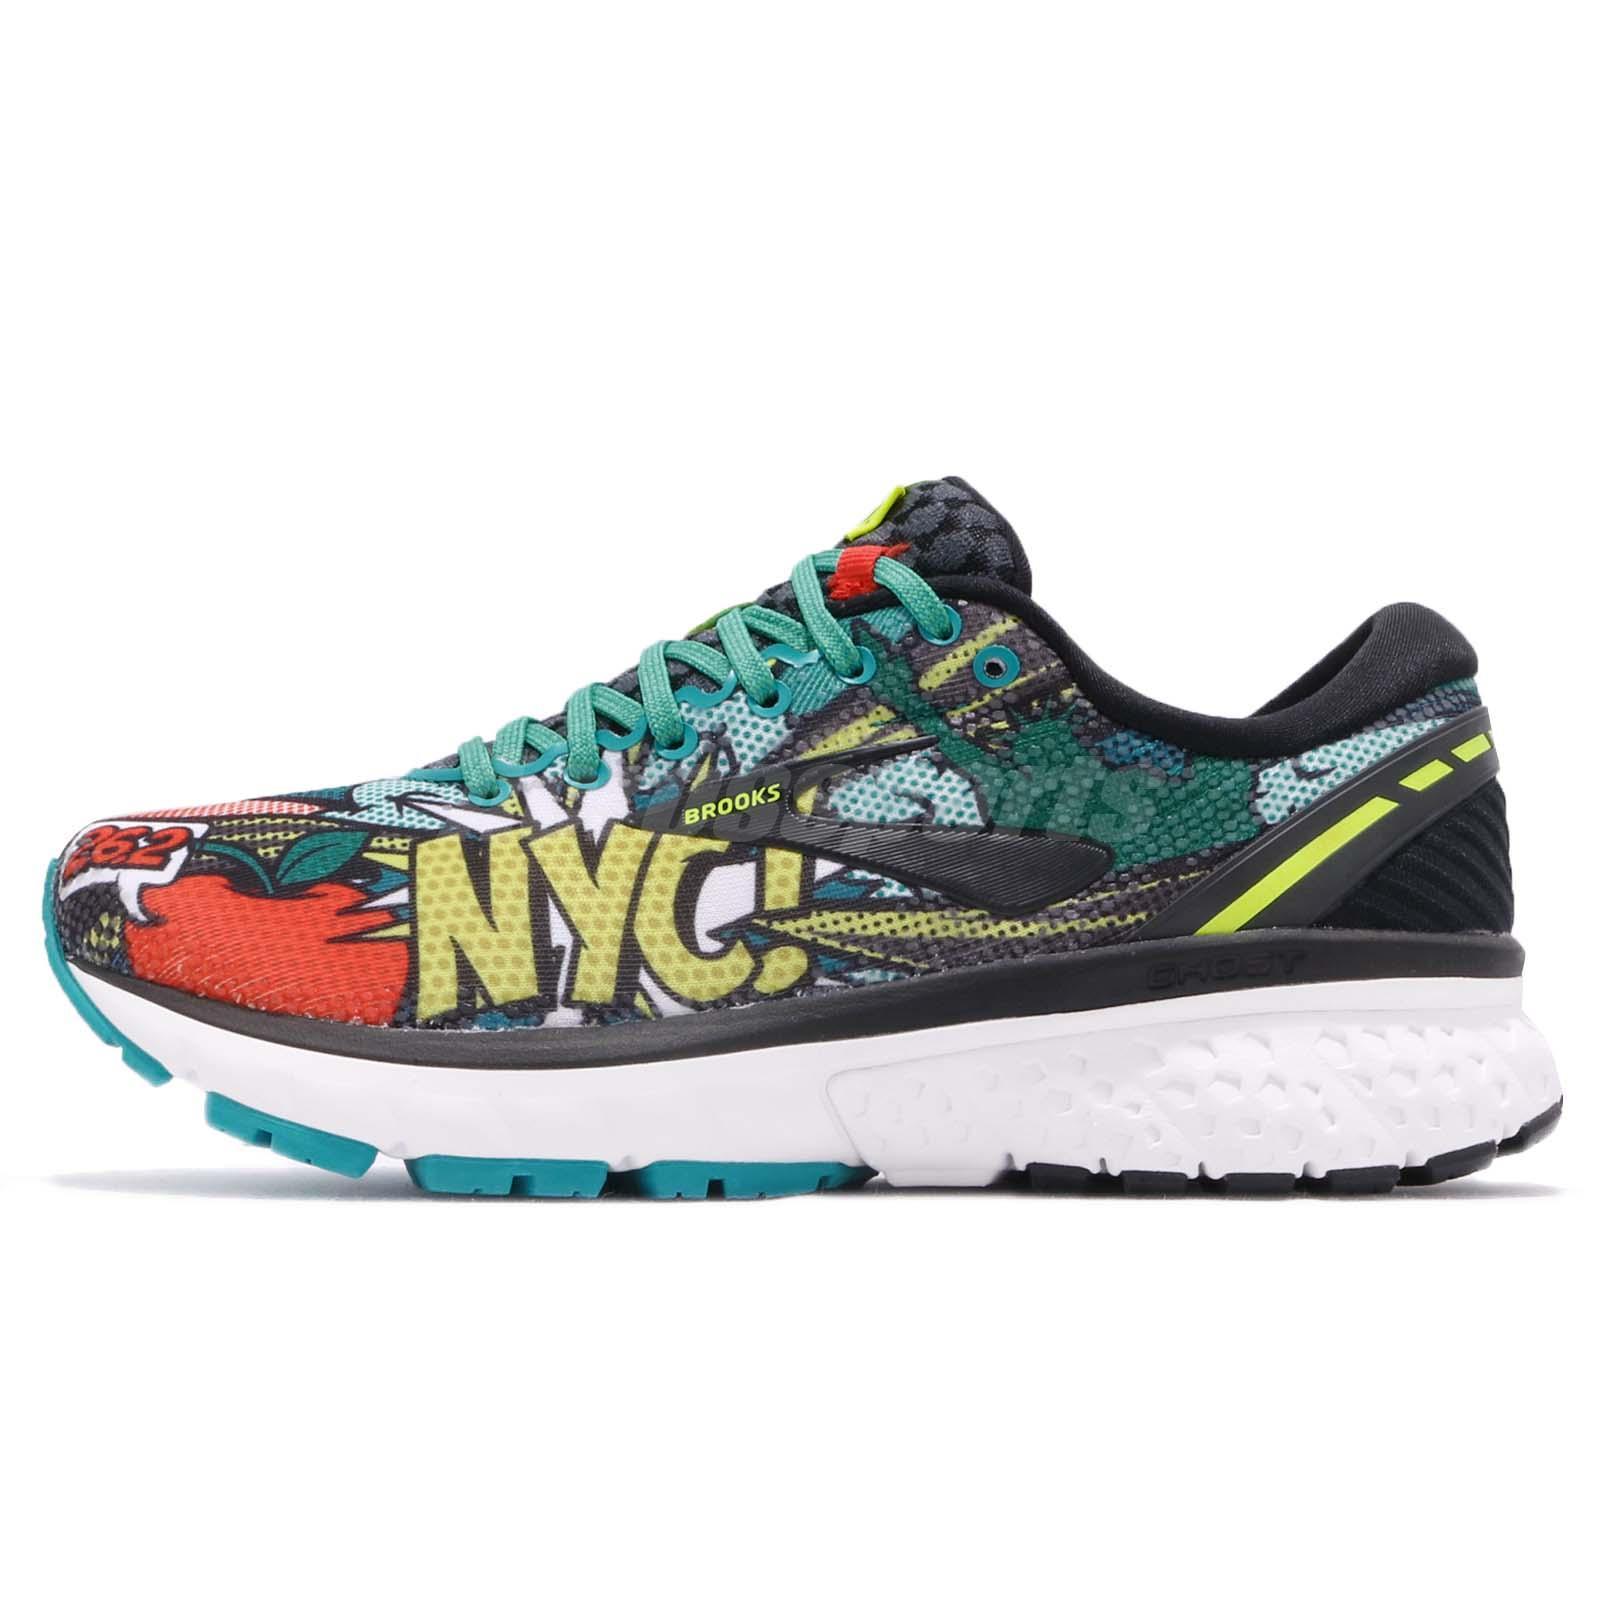 d2c8c95ee46 Brooks Ghost 11 New York Marathon Black Pop Art Women Running Shoes 120277  1B